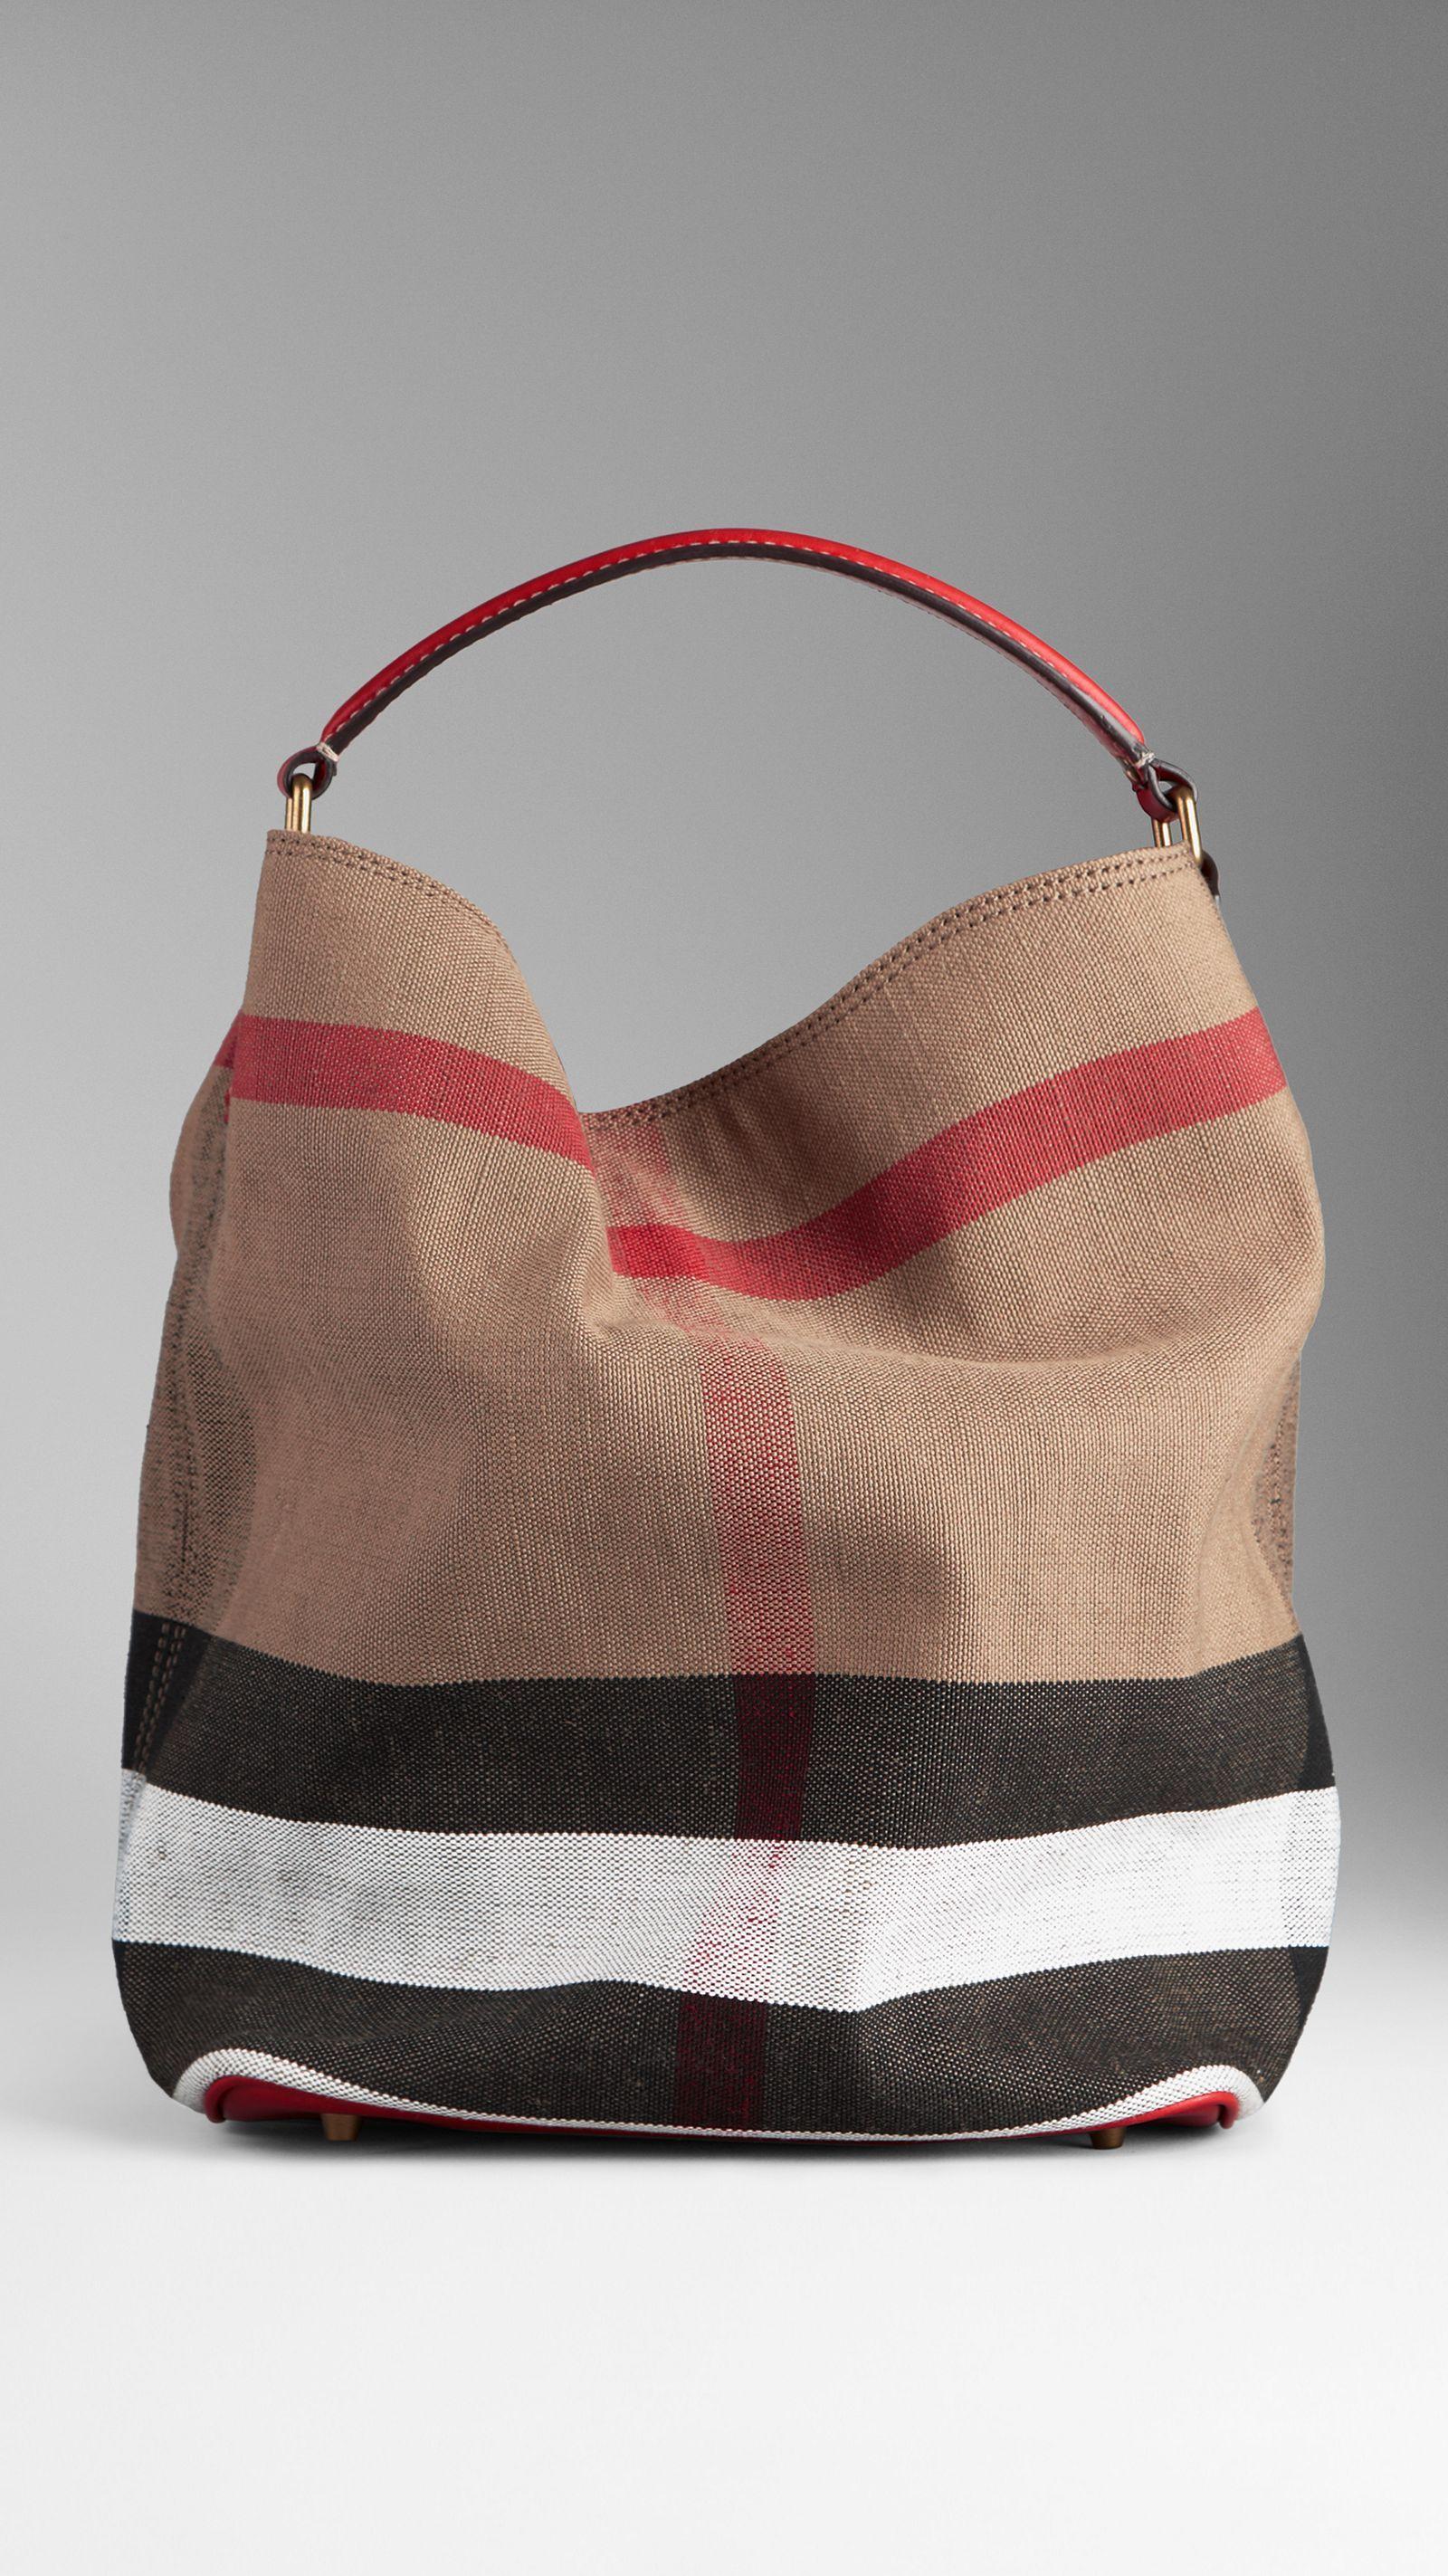 Medium Canvas Check Hobo Bag   Burberry   Bags   clutch 1d8a7f3cda